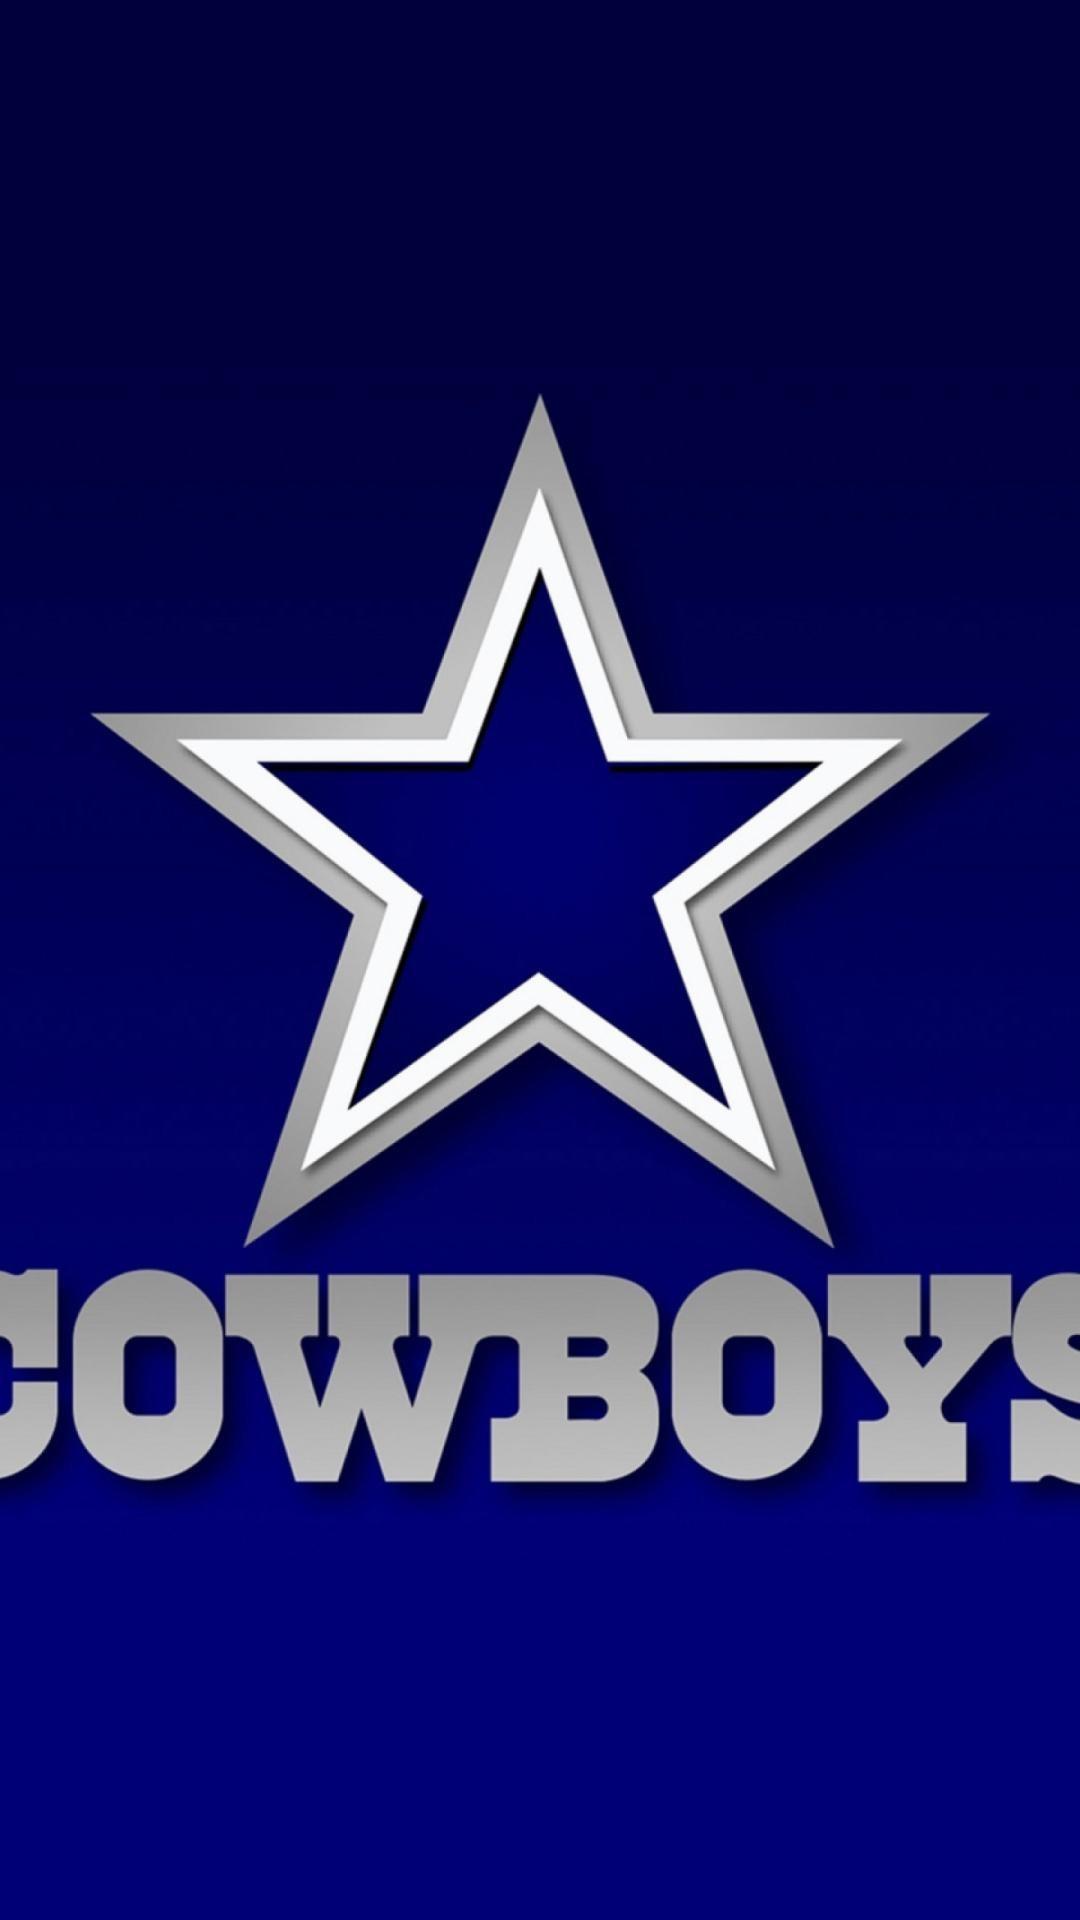 wallpaper.wiki-Blue-Star-Dallas-Cowboys-Iphone-Wallpaper-